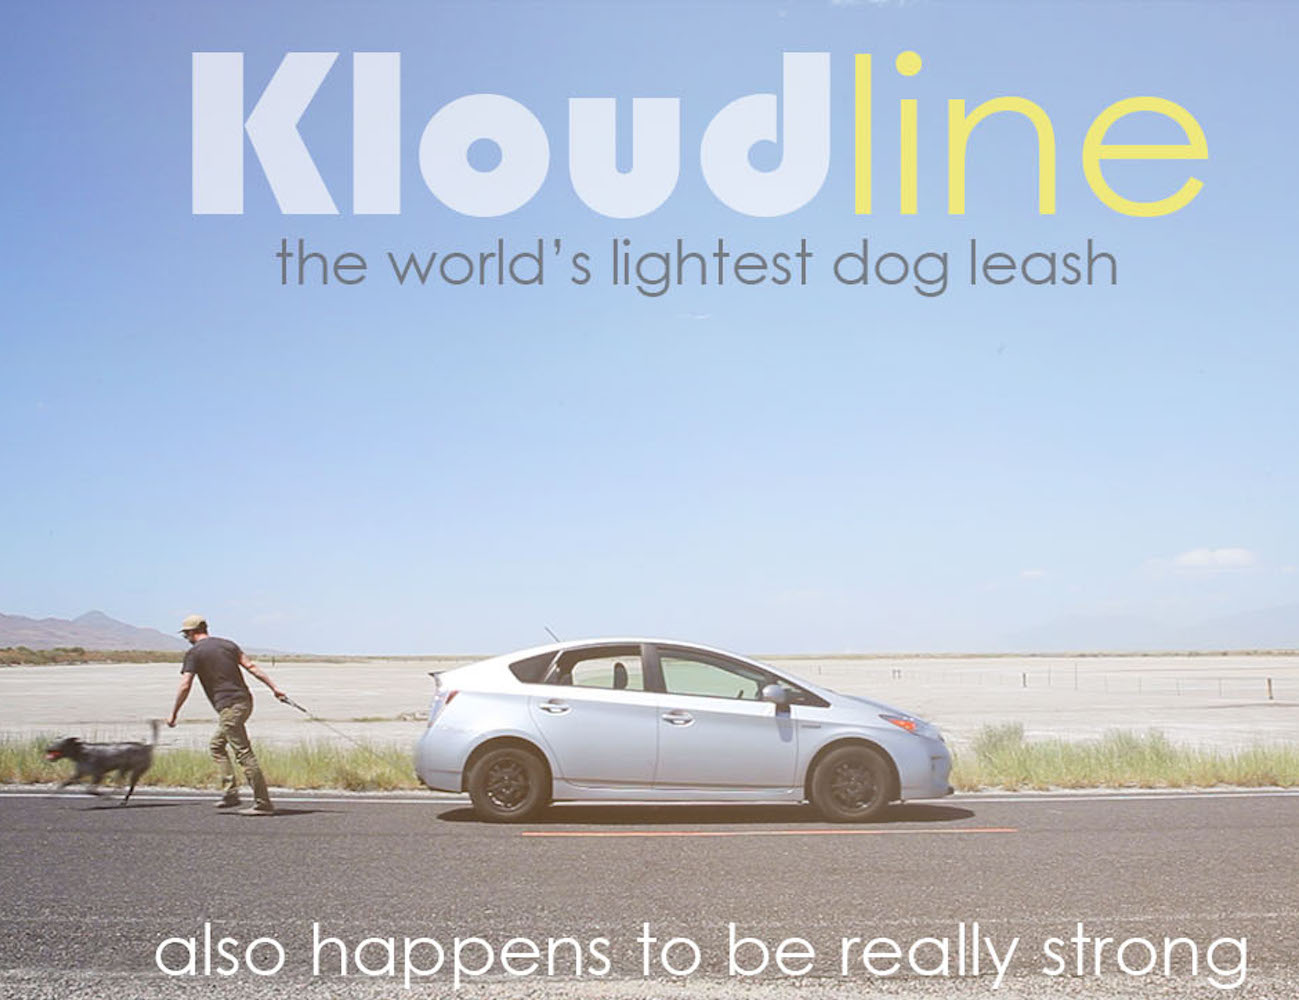 Kloudline – The World's Lightest Dog Leash